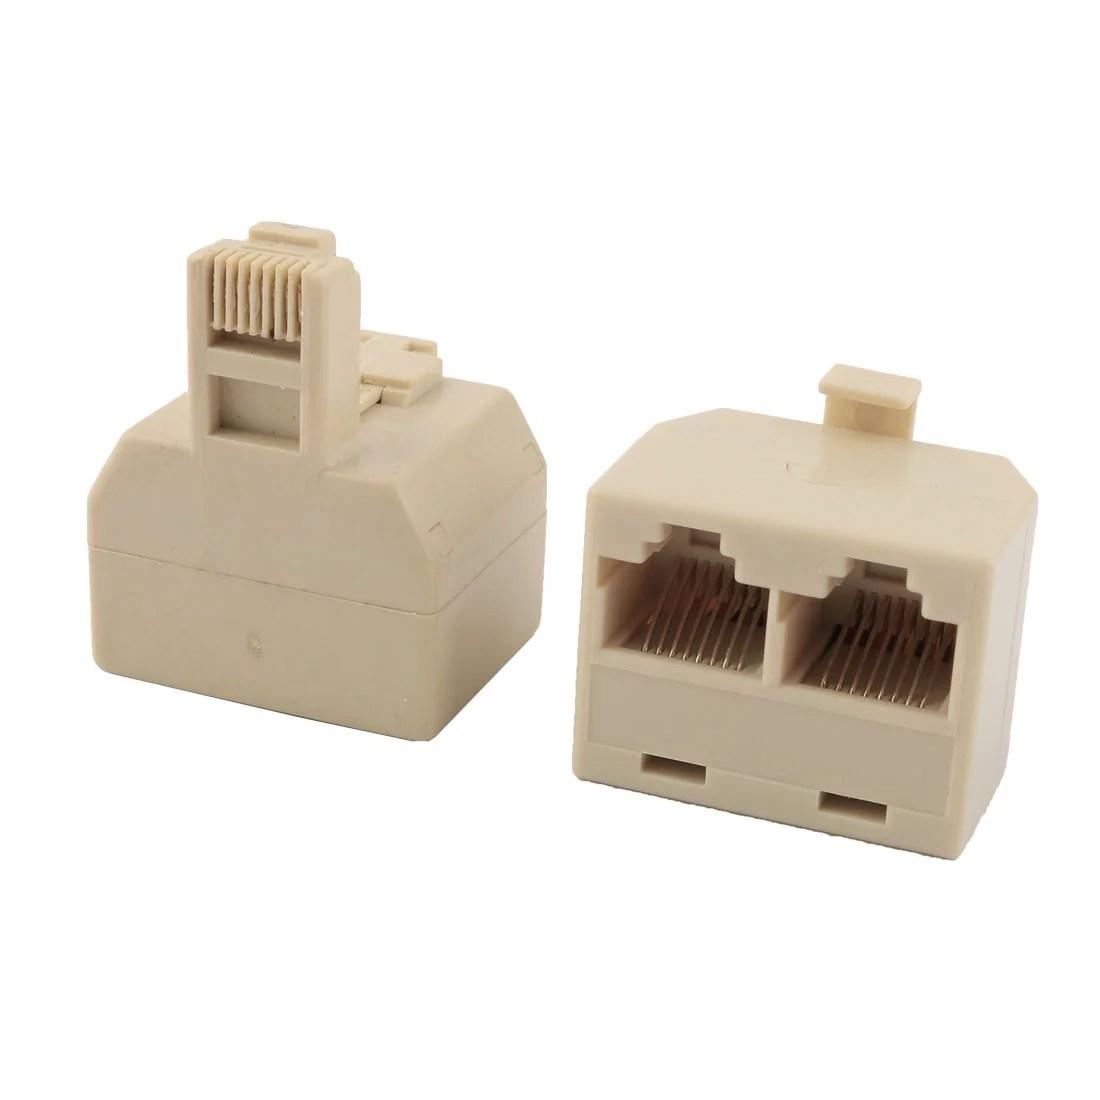 rj45 8p8c keystone 1 male to 2 female port network cable splitter beige 2pcs [ 1100 x 1100 Pixel ]